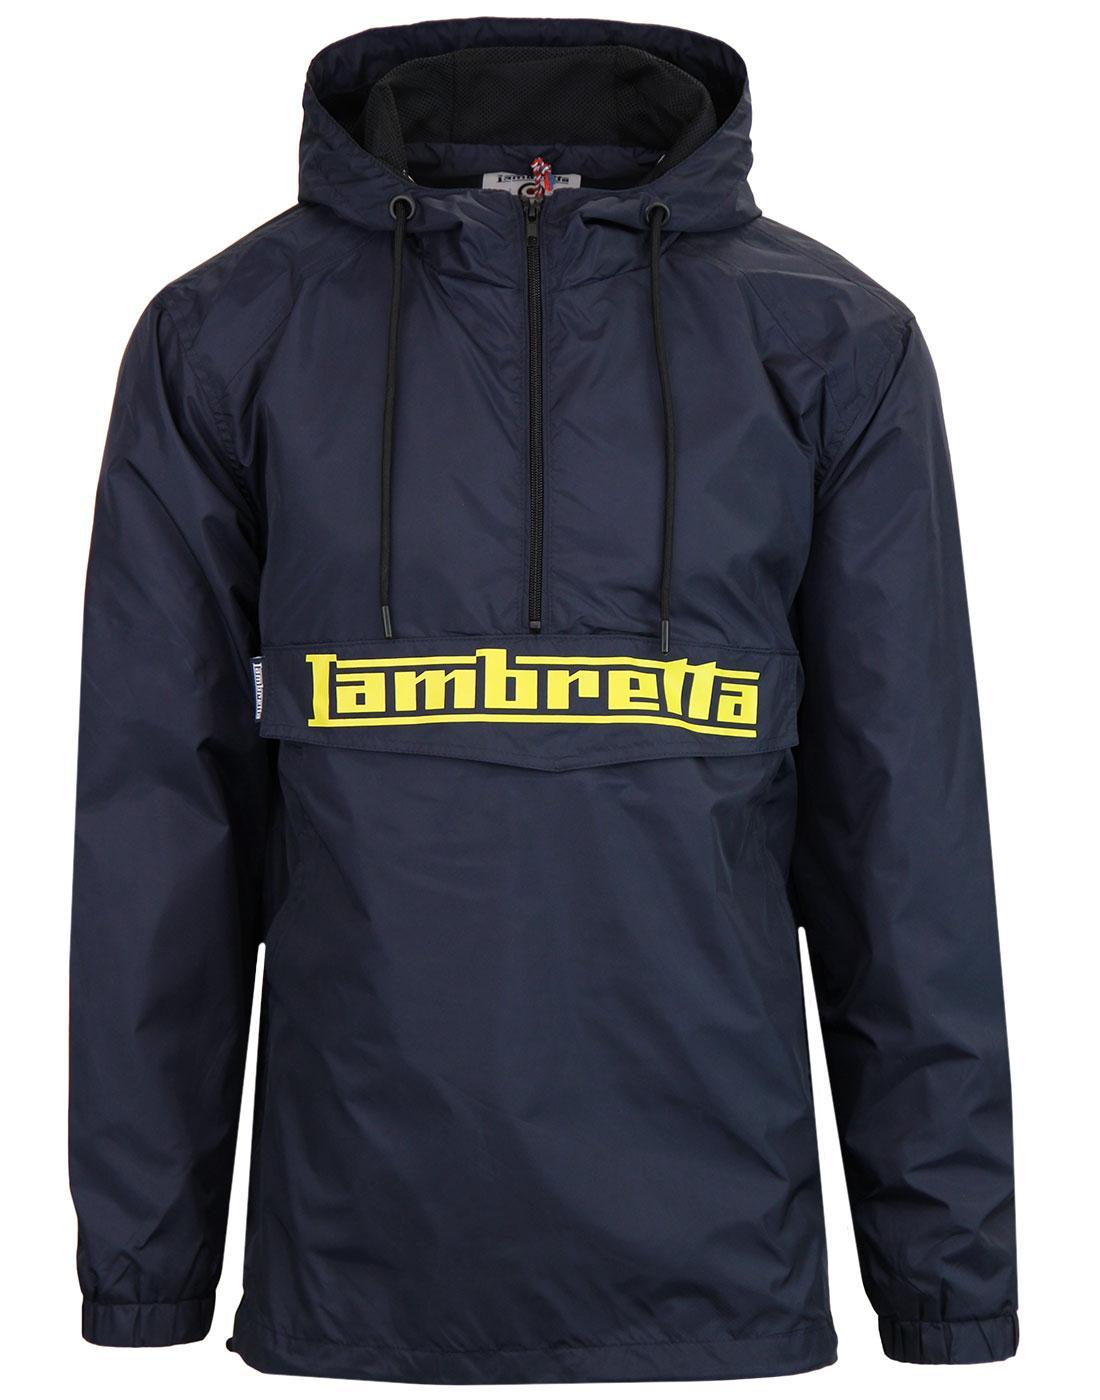 LAMBRETTA Retro Mod Overhead Cagoule Jacket NAVY